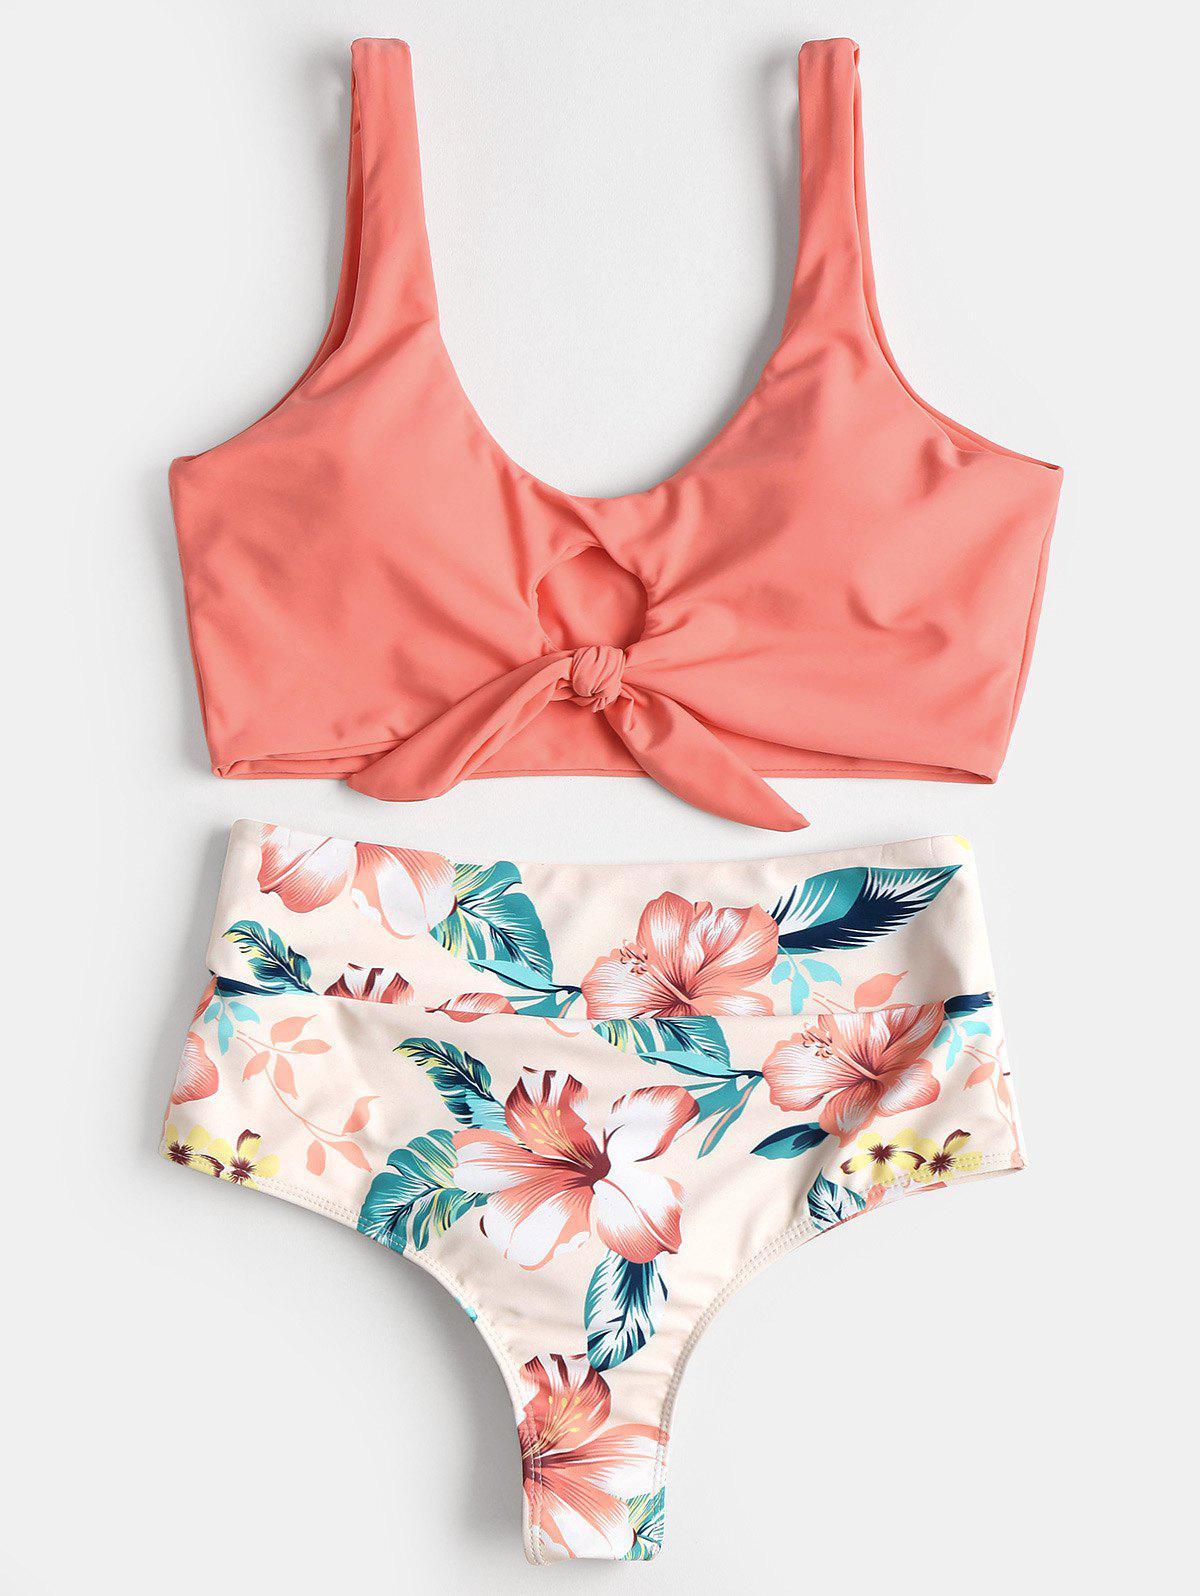 Knotted Floral Scrunch Butt Bikini Set